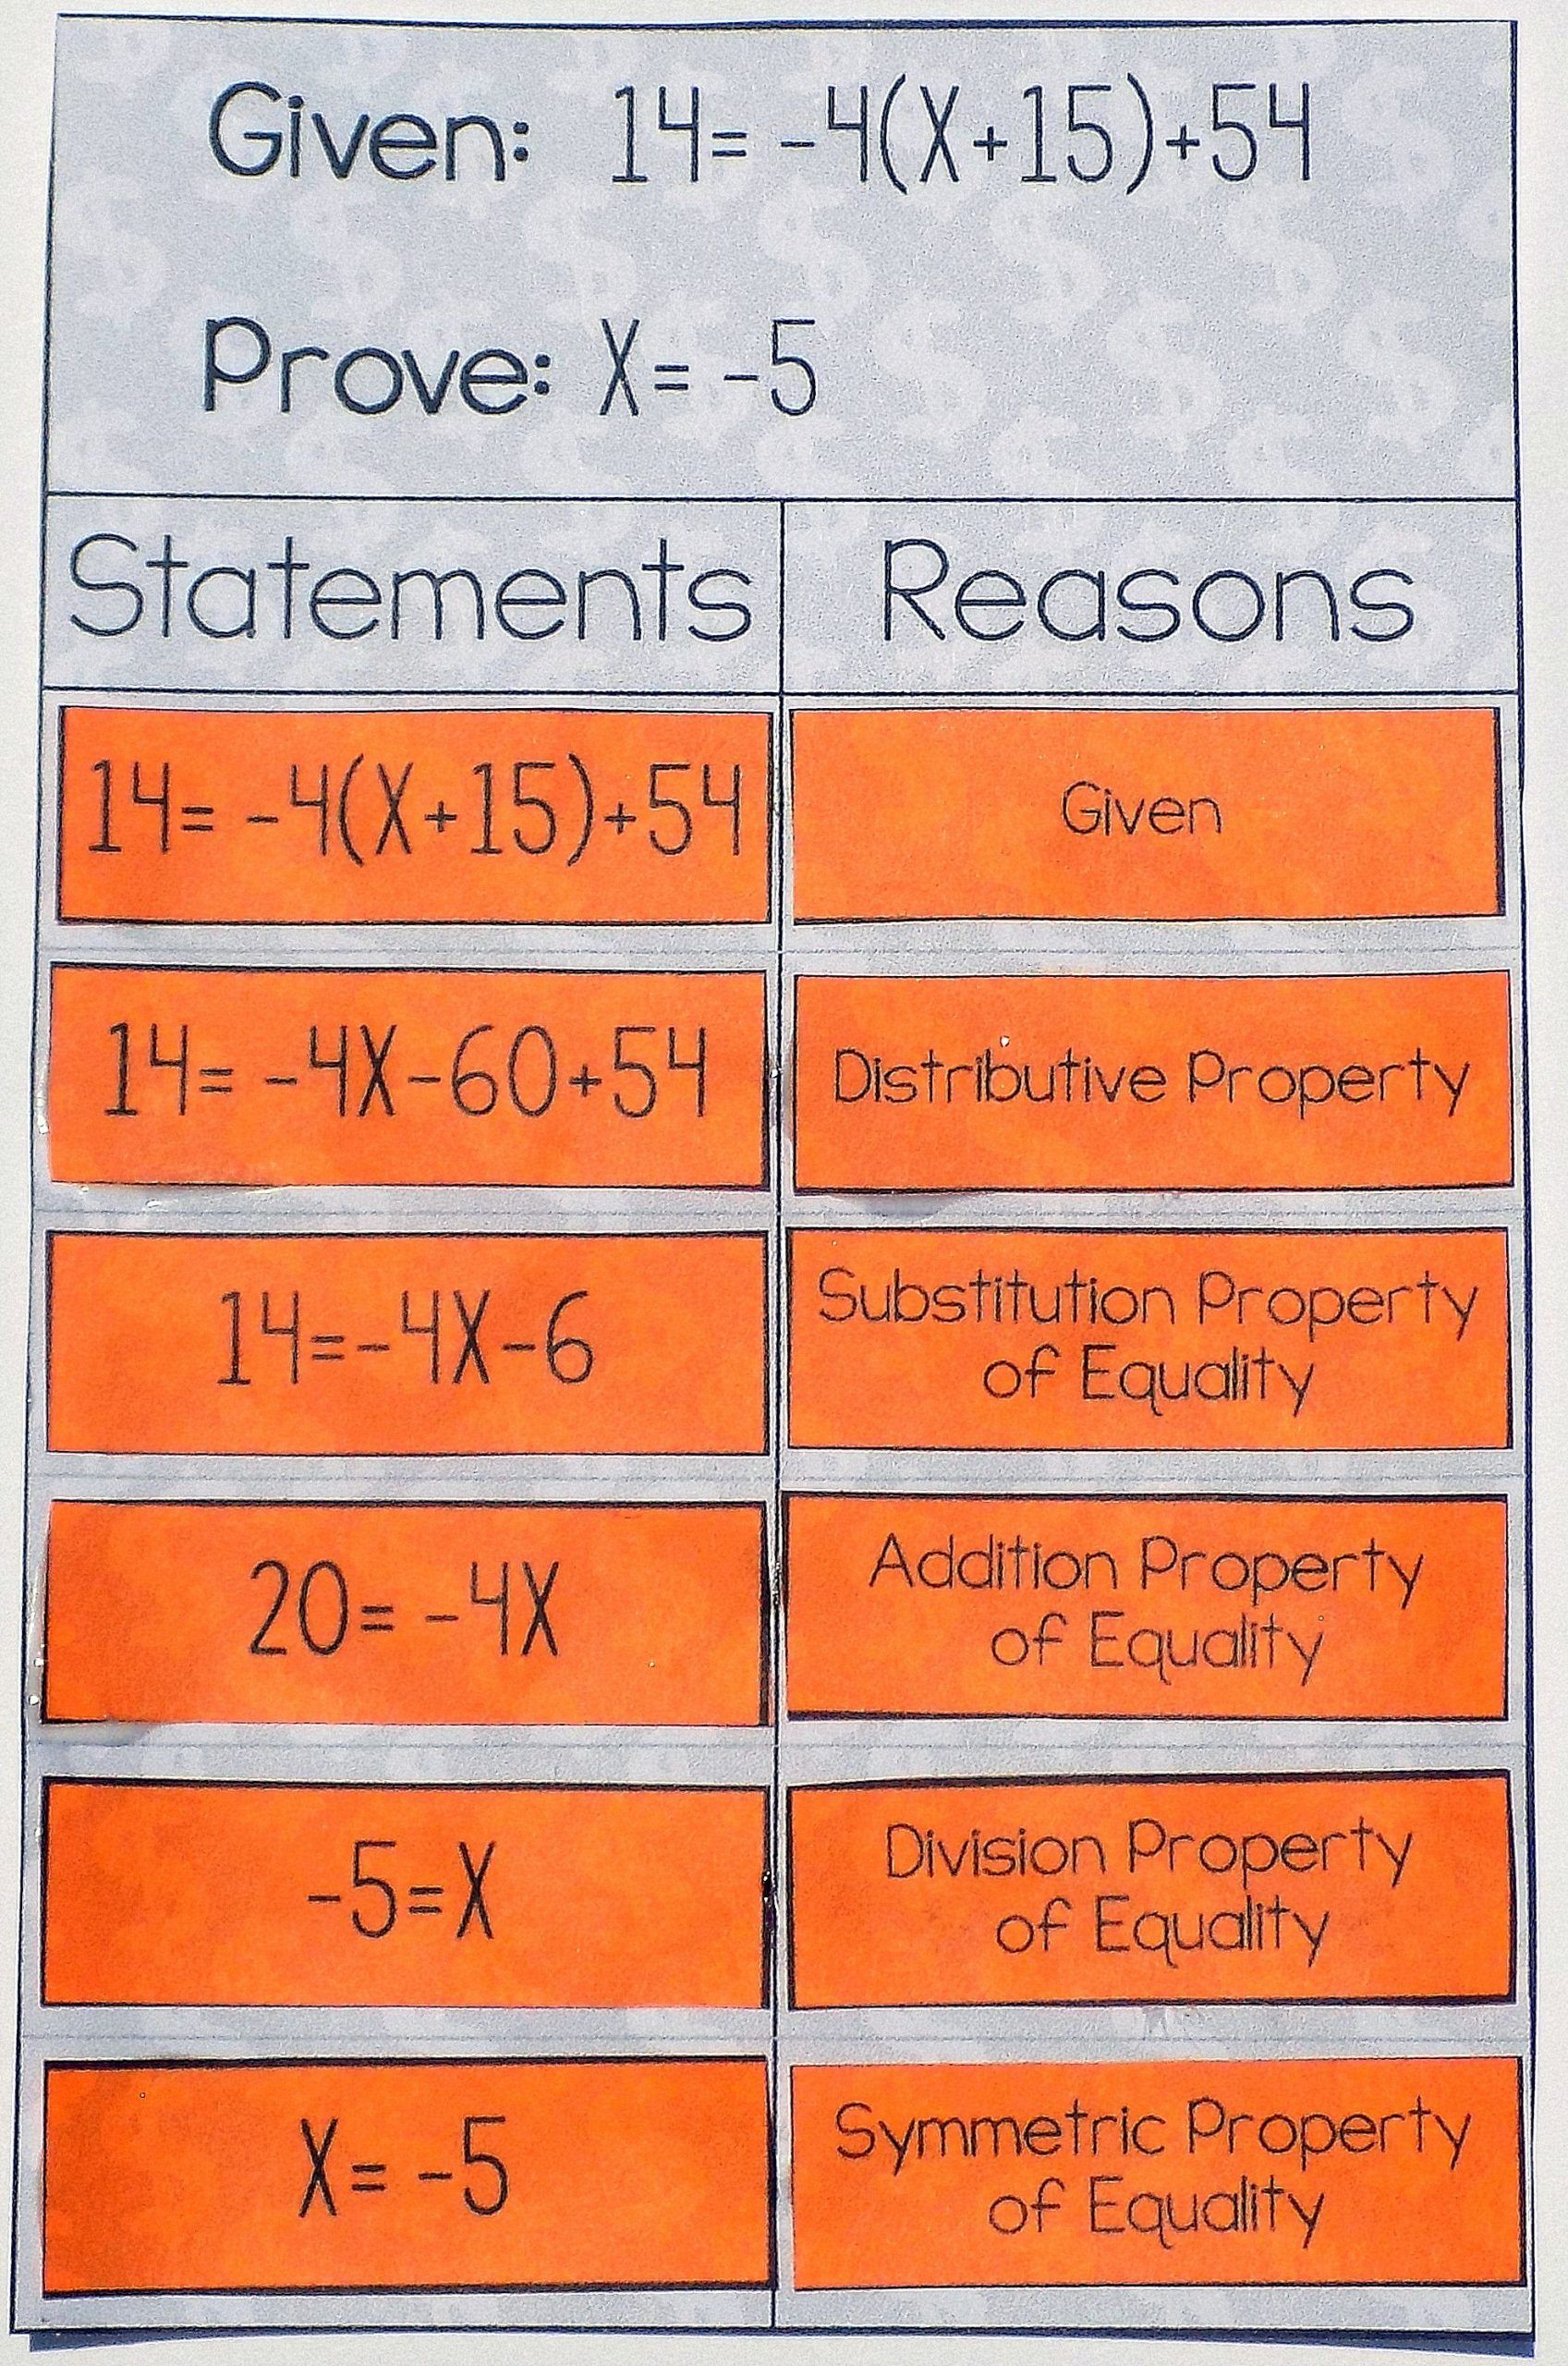 Algebraic Proofs Worksheet With Answers Algebraic Proof Activity High School Geometry Proofs In 2020 Geometry Proofs Algebraic Proof Letter Worksheets For Preschool